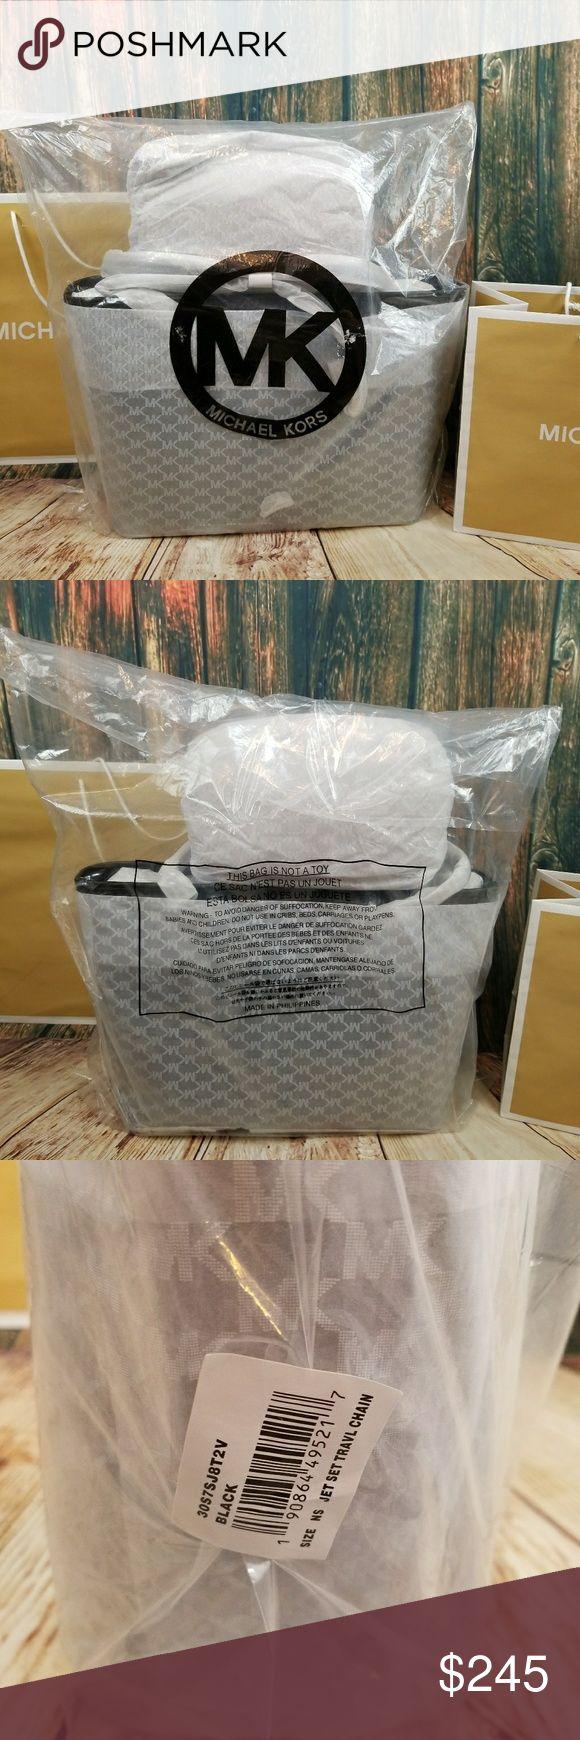 Michael Kors Jet Set Chain Handle Tote Beautiful chain handle tote in Black. Michael Kors Bags Totes